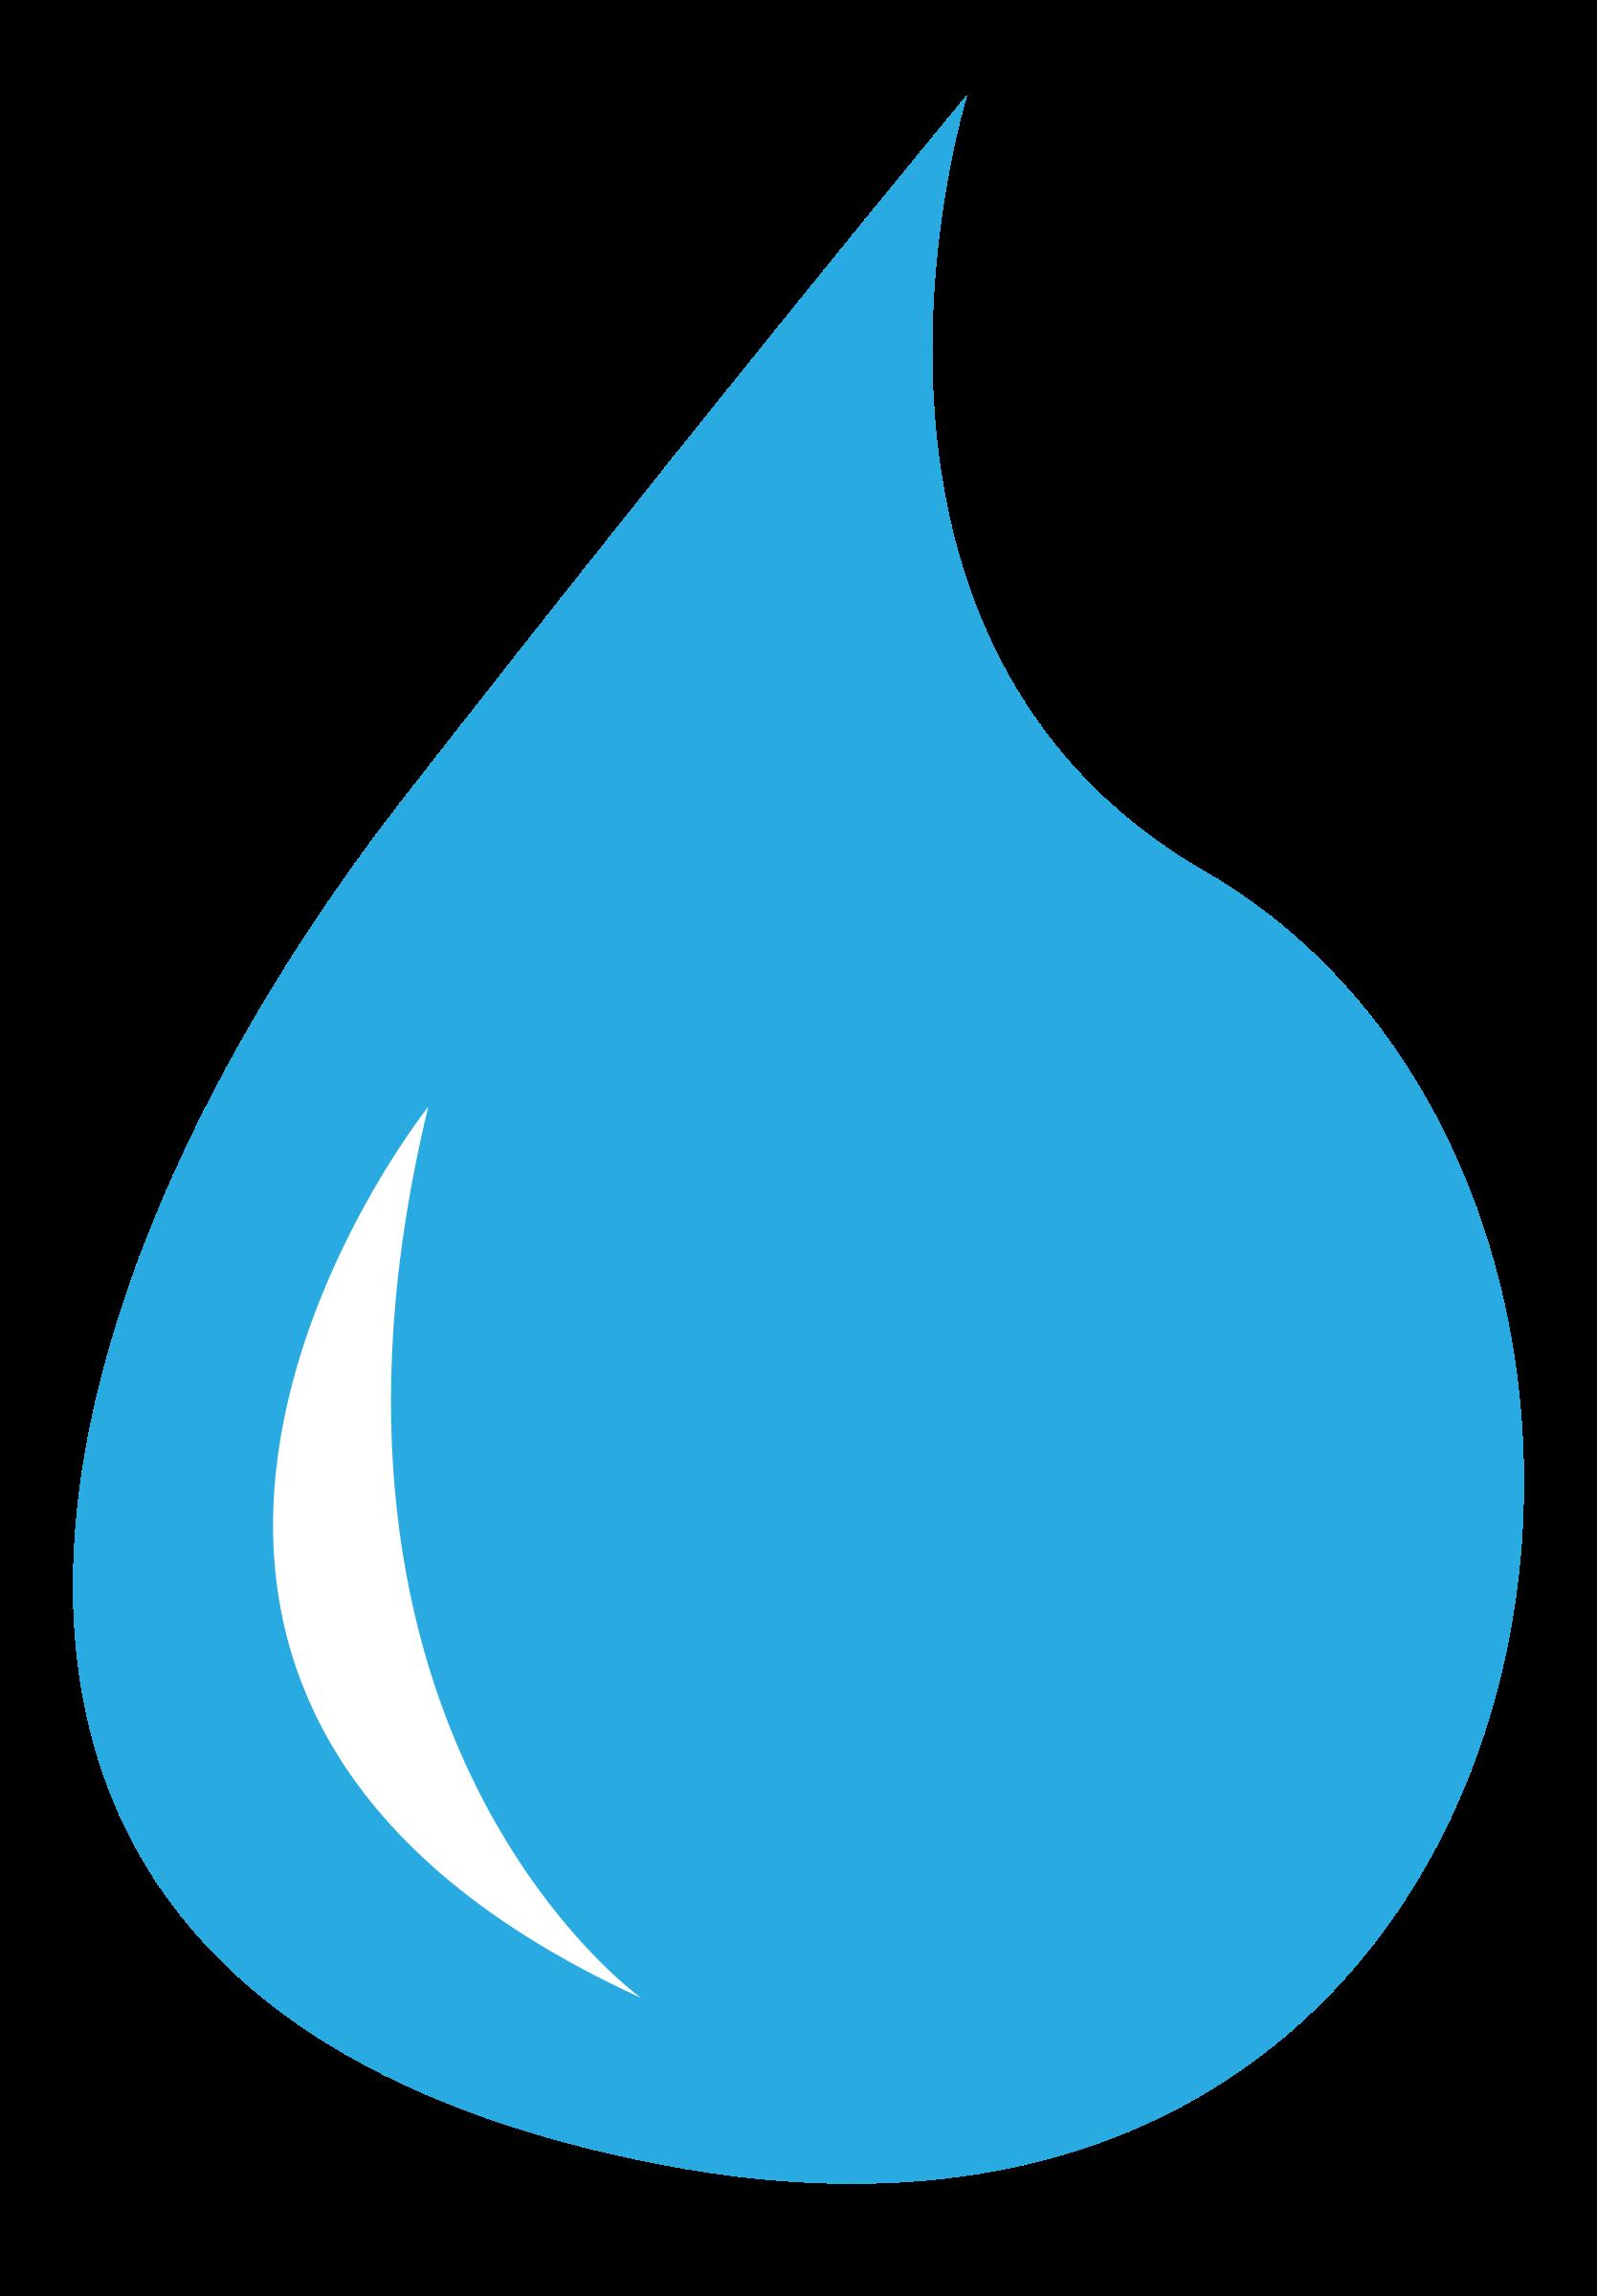 Water ace clipart jpg transparent Drop Of Water Clipart Black And White - ClipArt Best jpg transparent